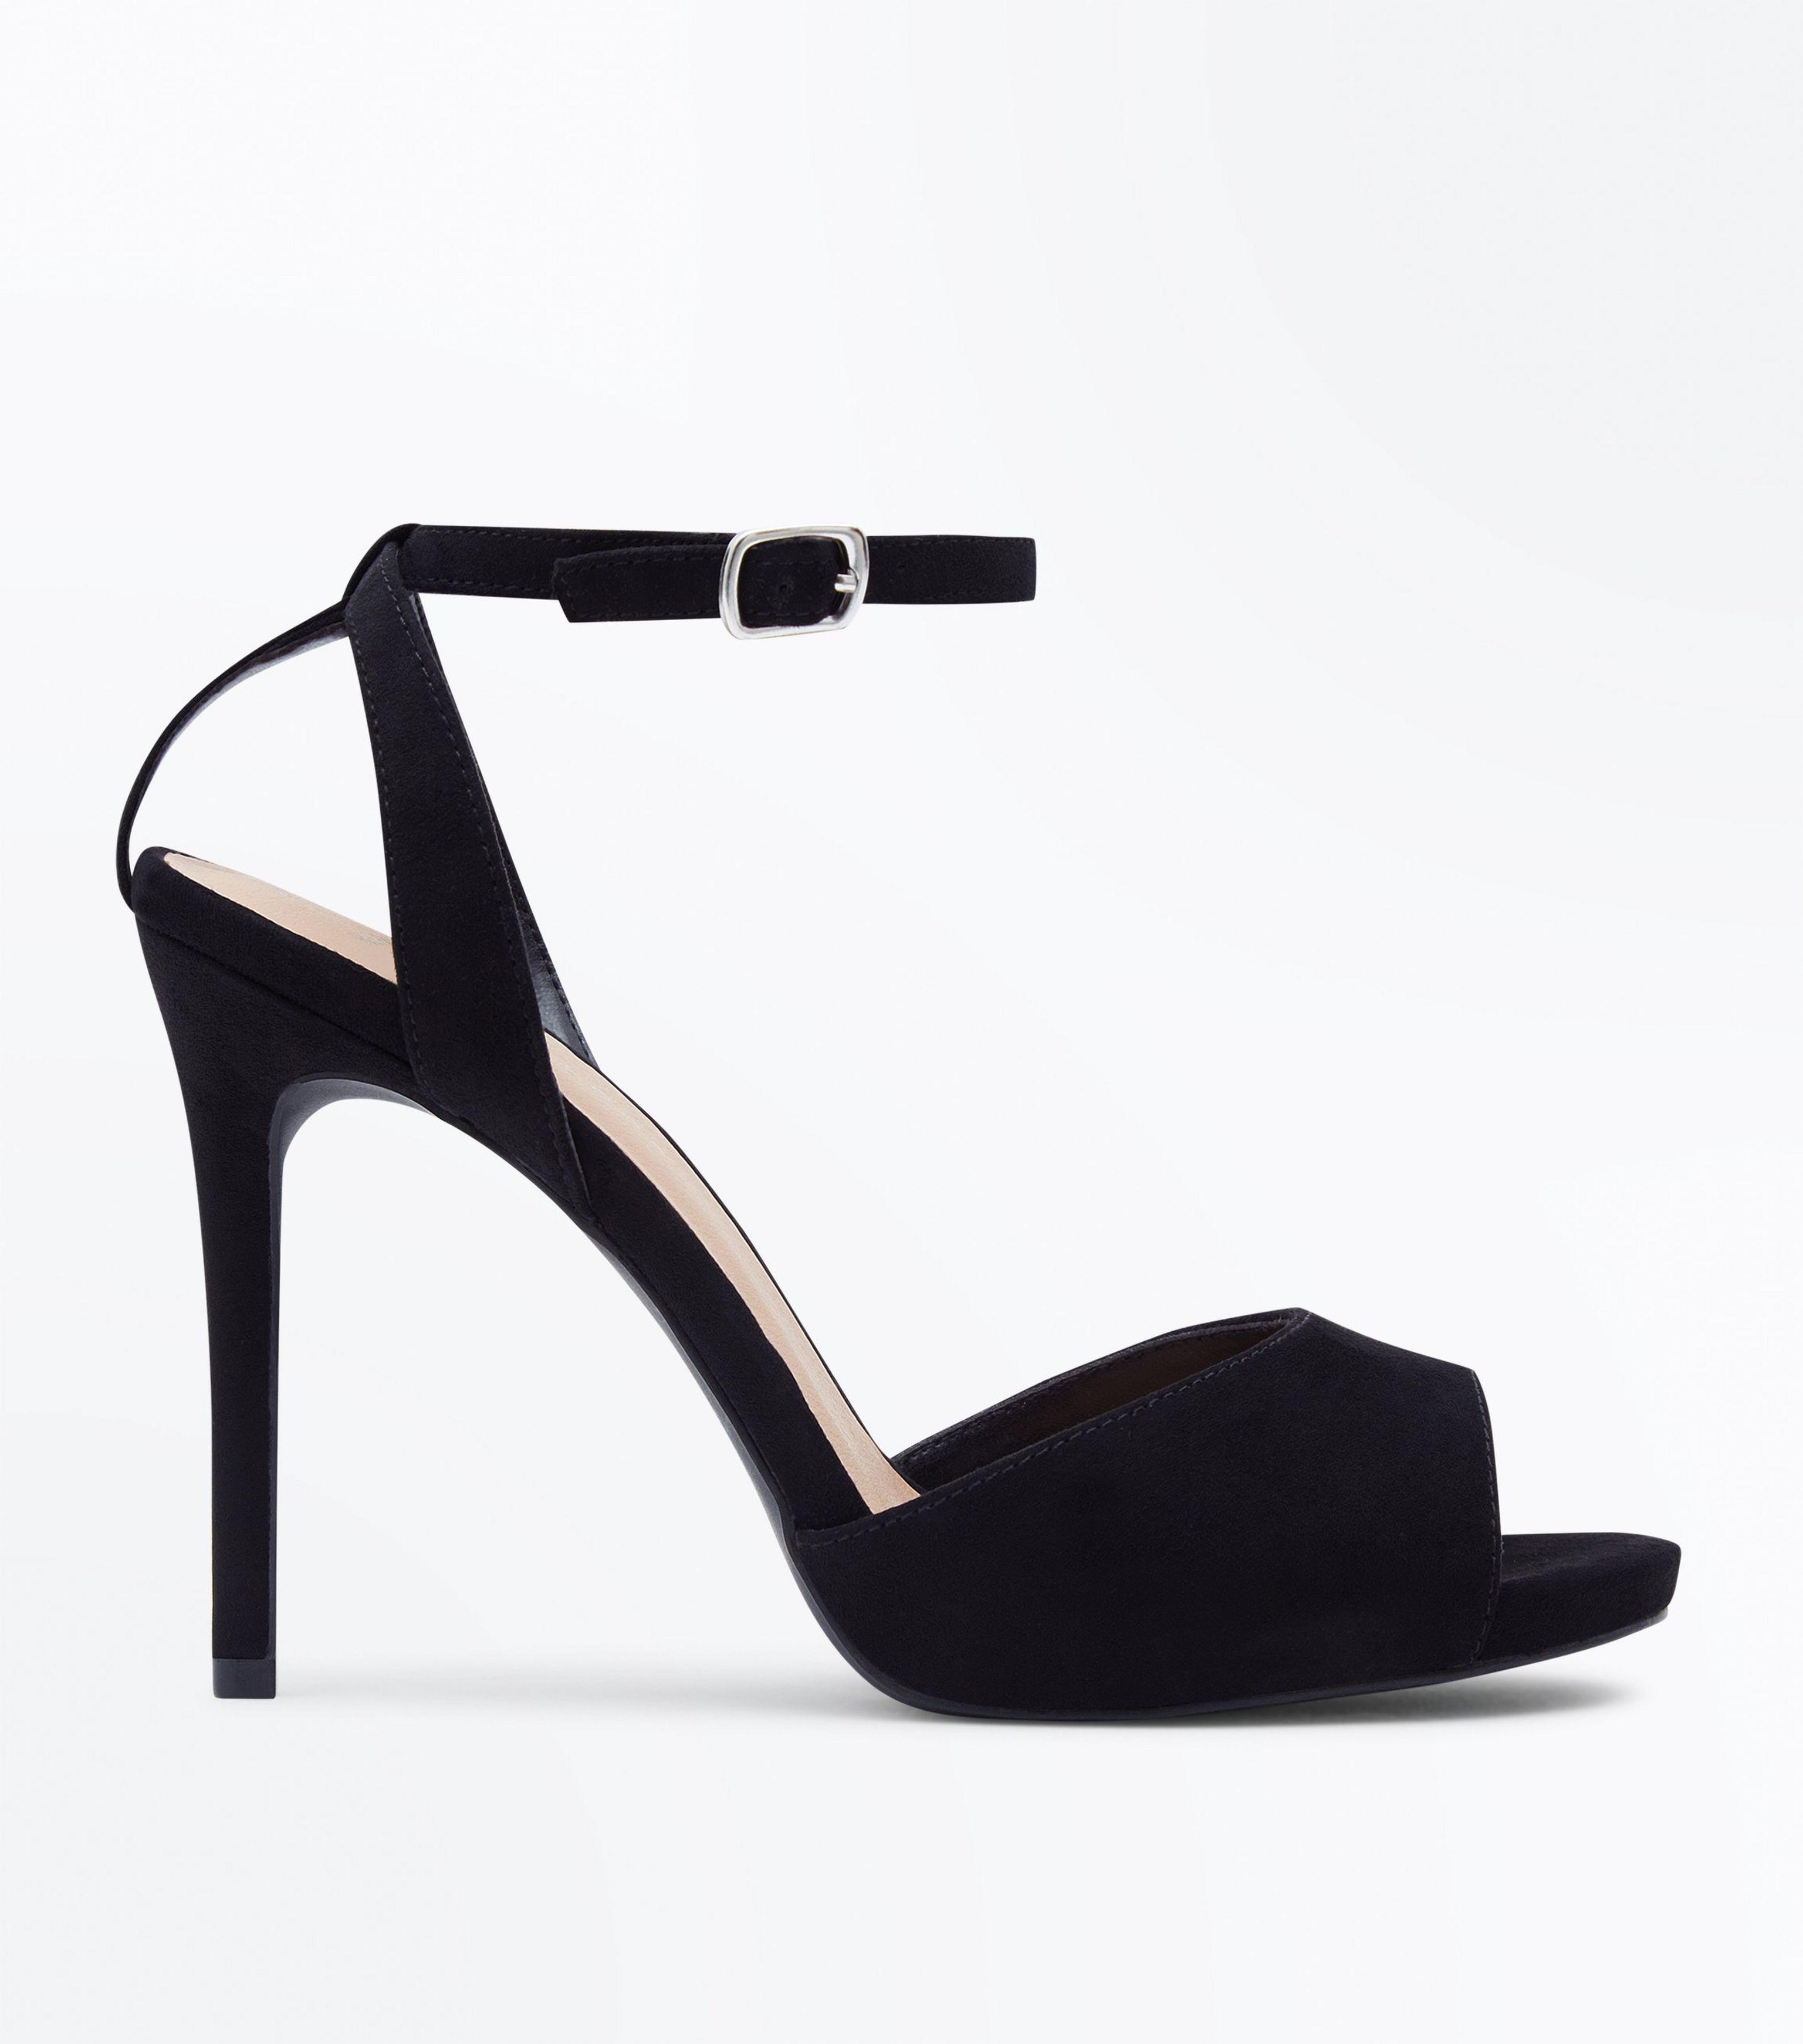 290d47efc20e New Look Wide Fit Black Peep Toe Stiletto Sandals in Black - Lyst